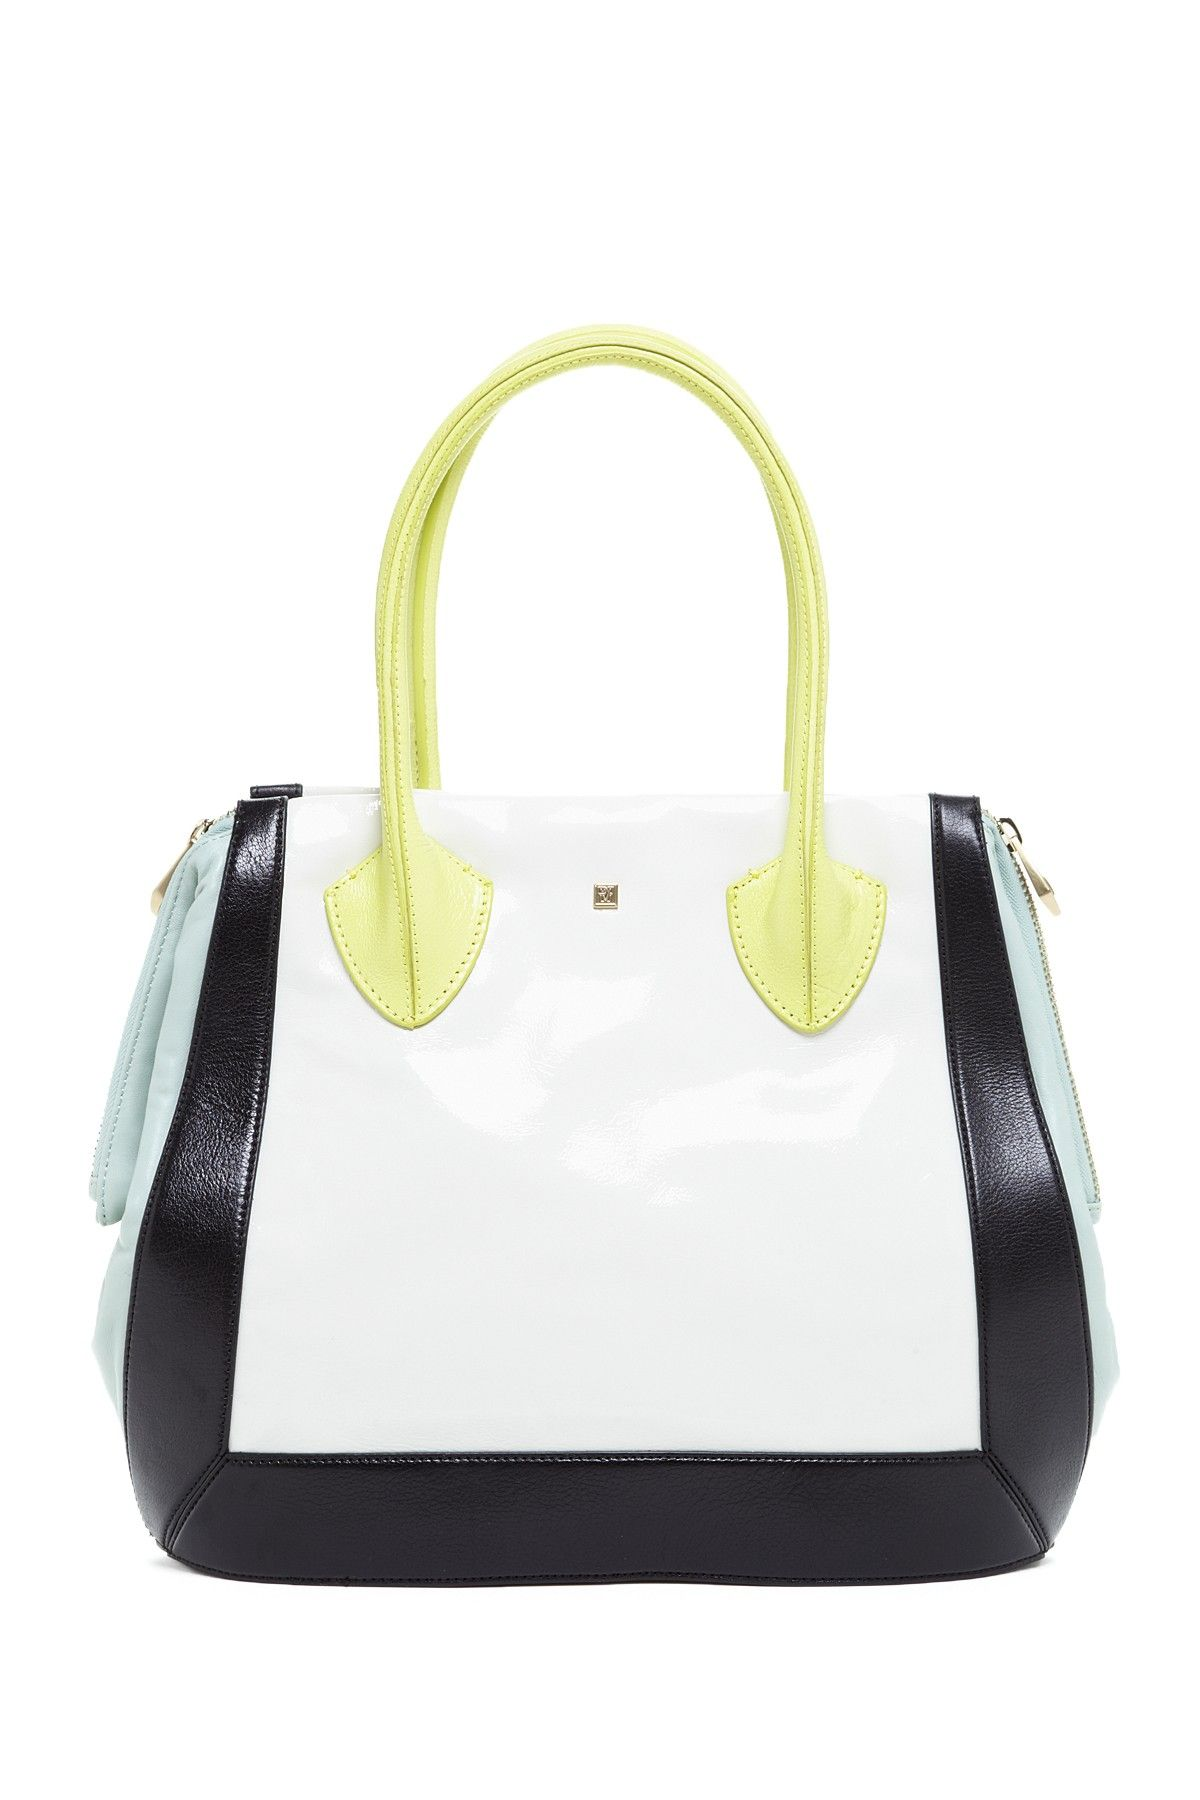 Handbag Hysteria  Pour La Victoire Palermo Tote - Love how this resembles a bowling ball bag.